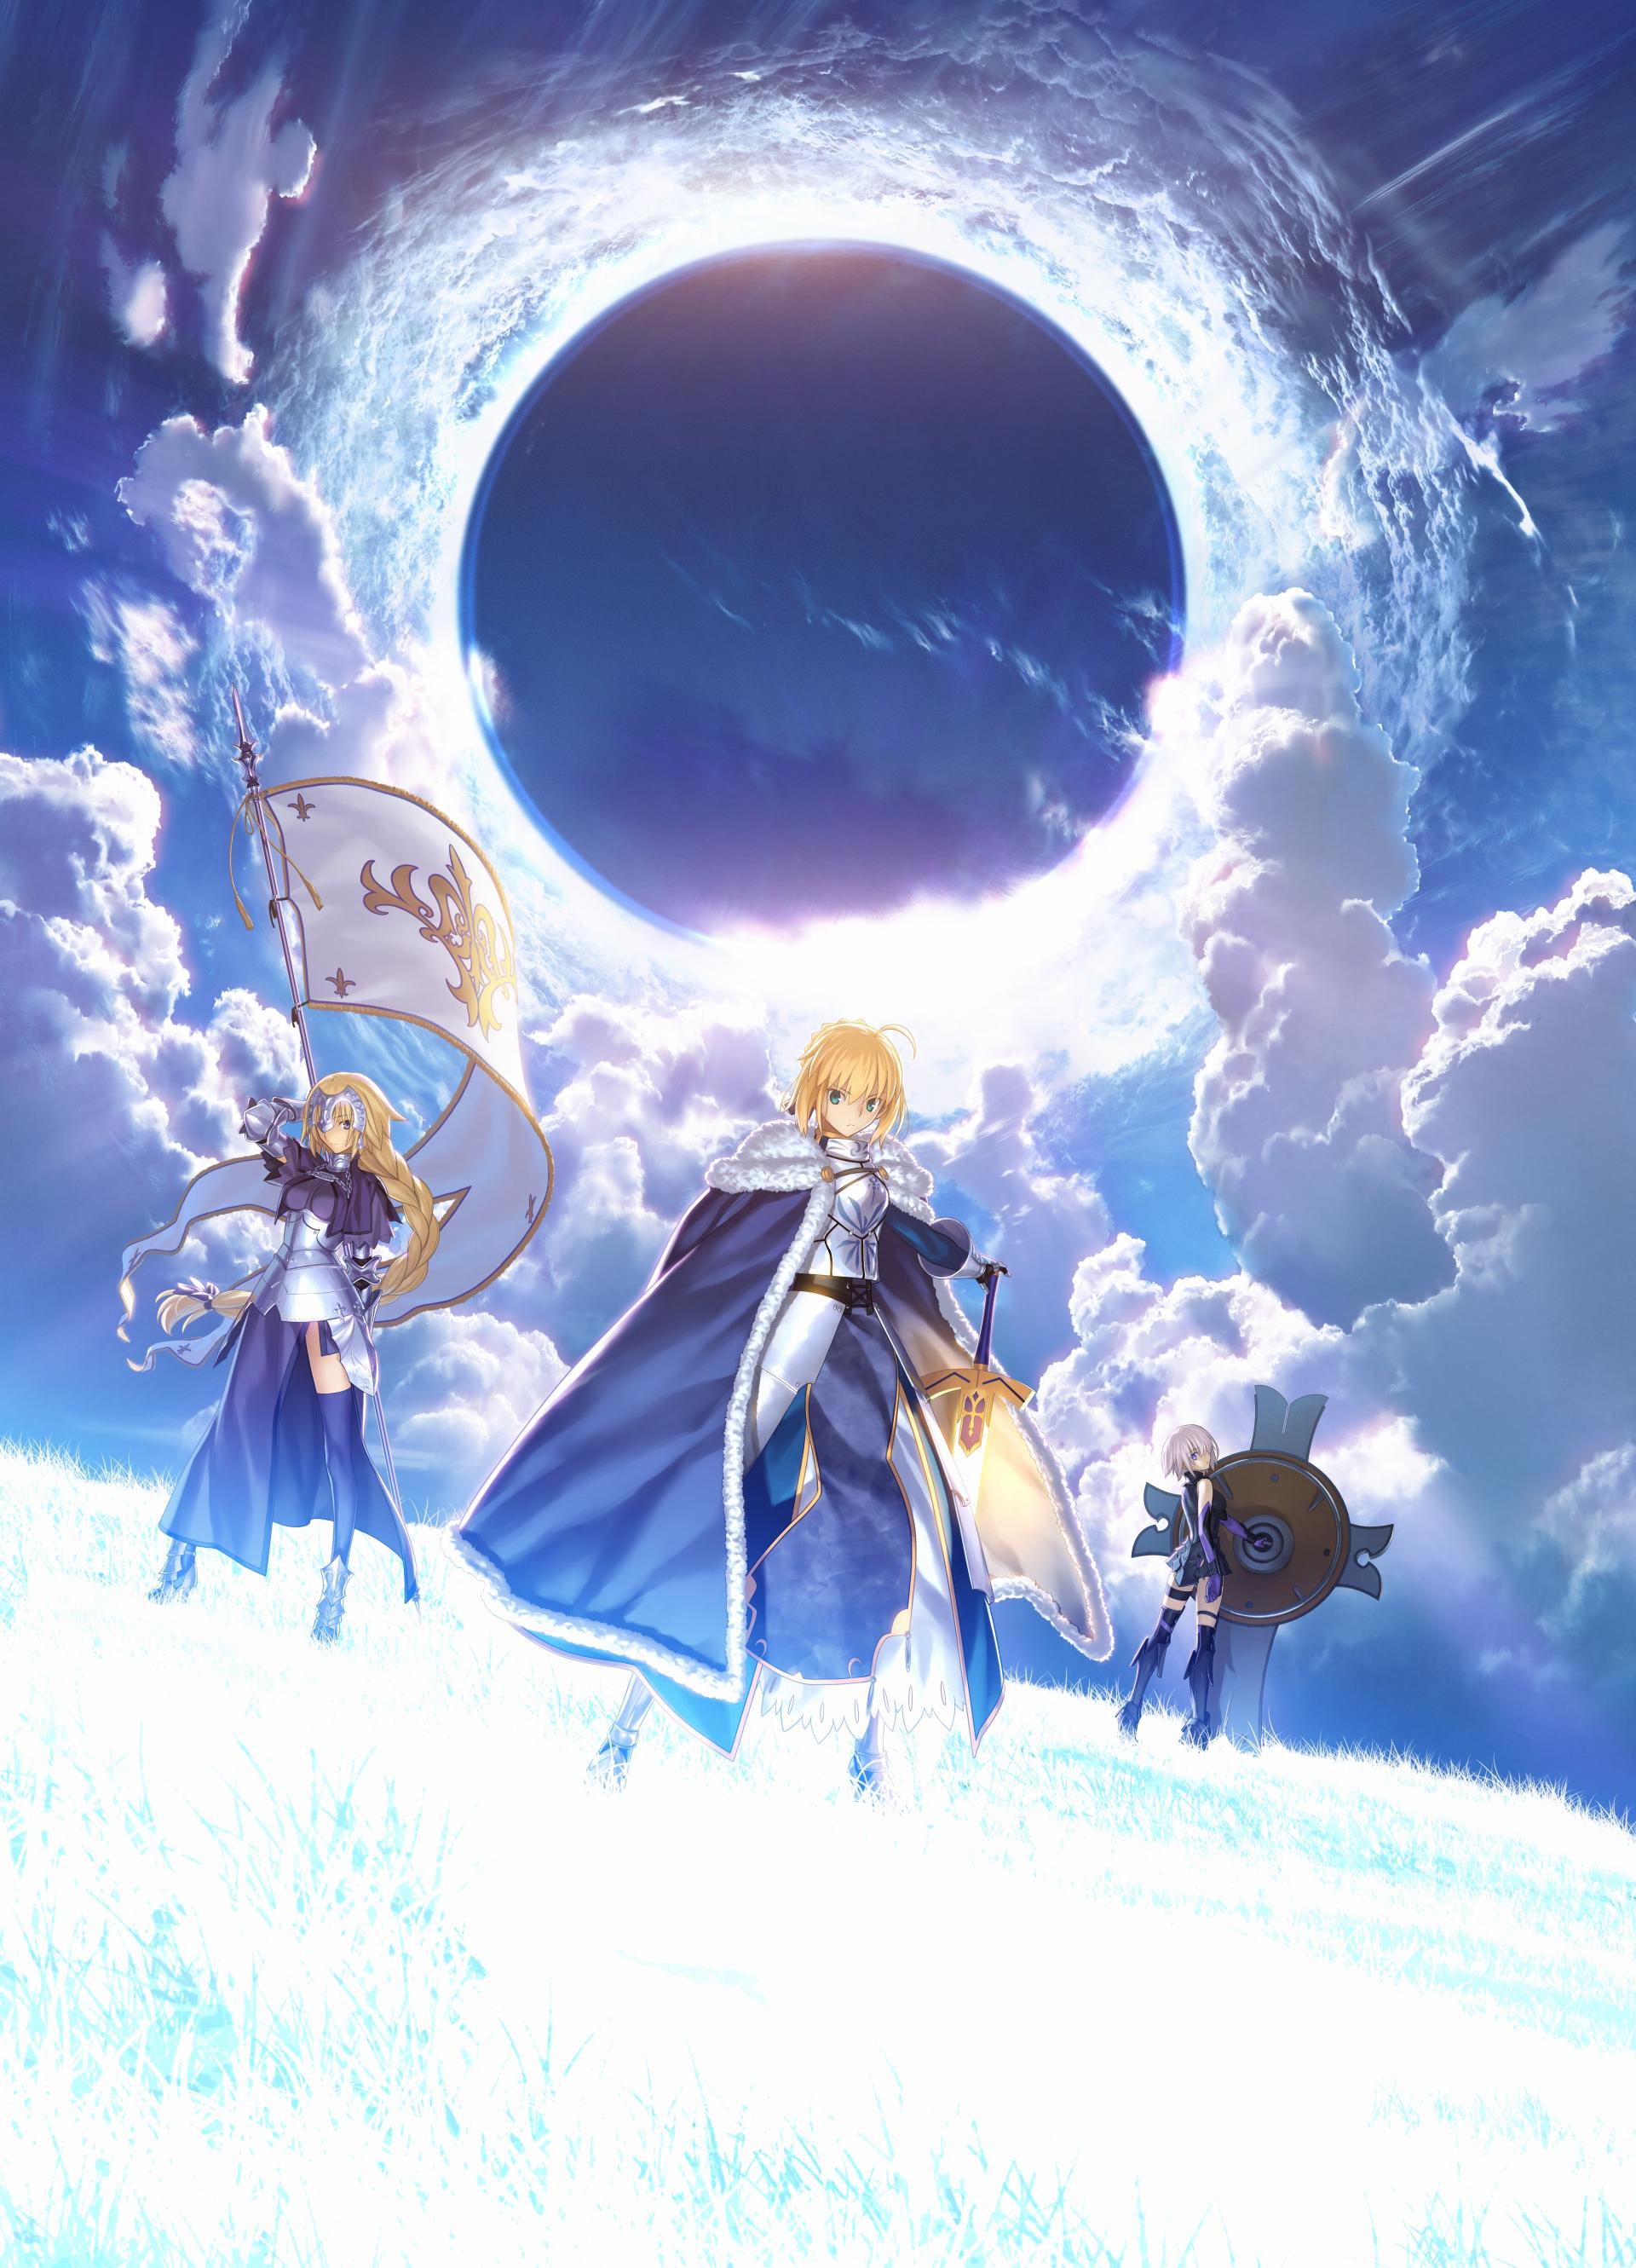 Wallpaper : illustration, anime, Saber, Fate Grand Order